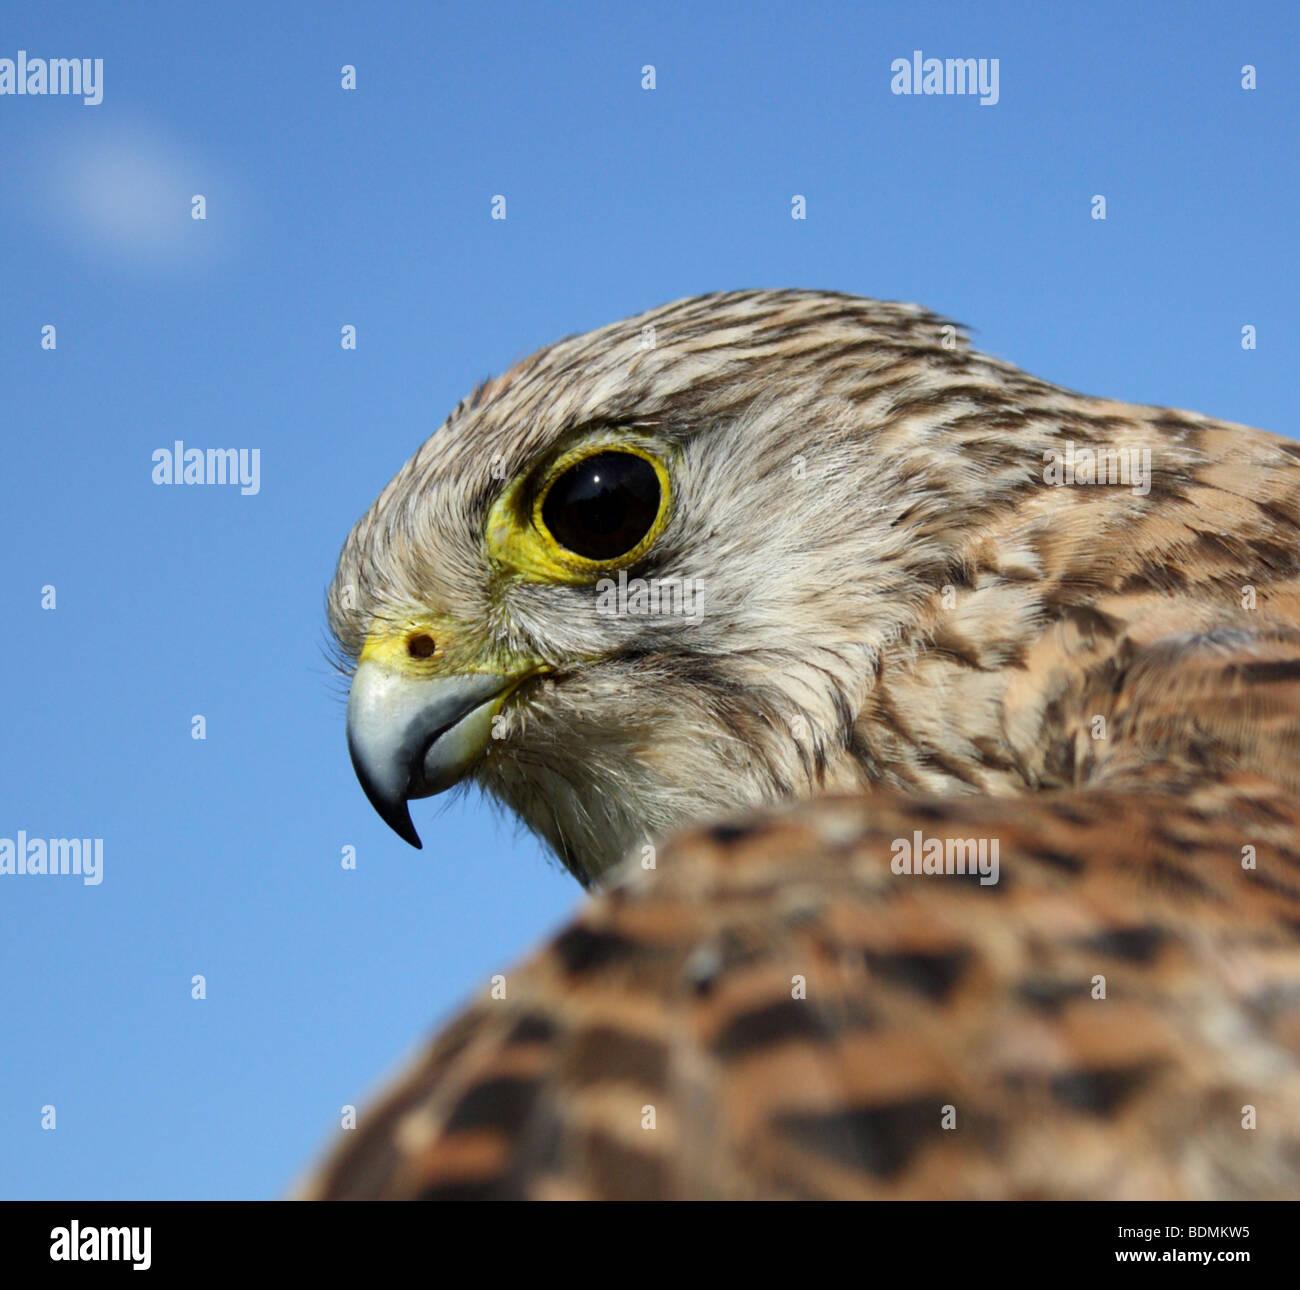 Young Common Kestrel (Falco tinnunculus), UK 2009 - Stock Image